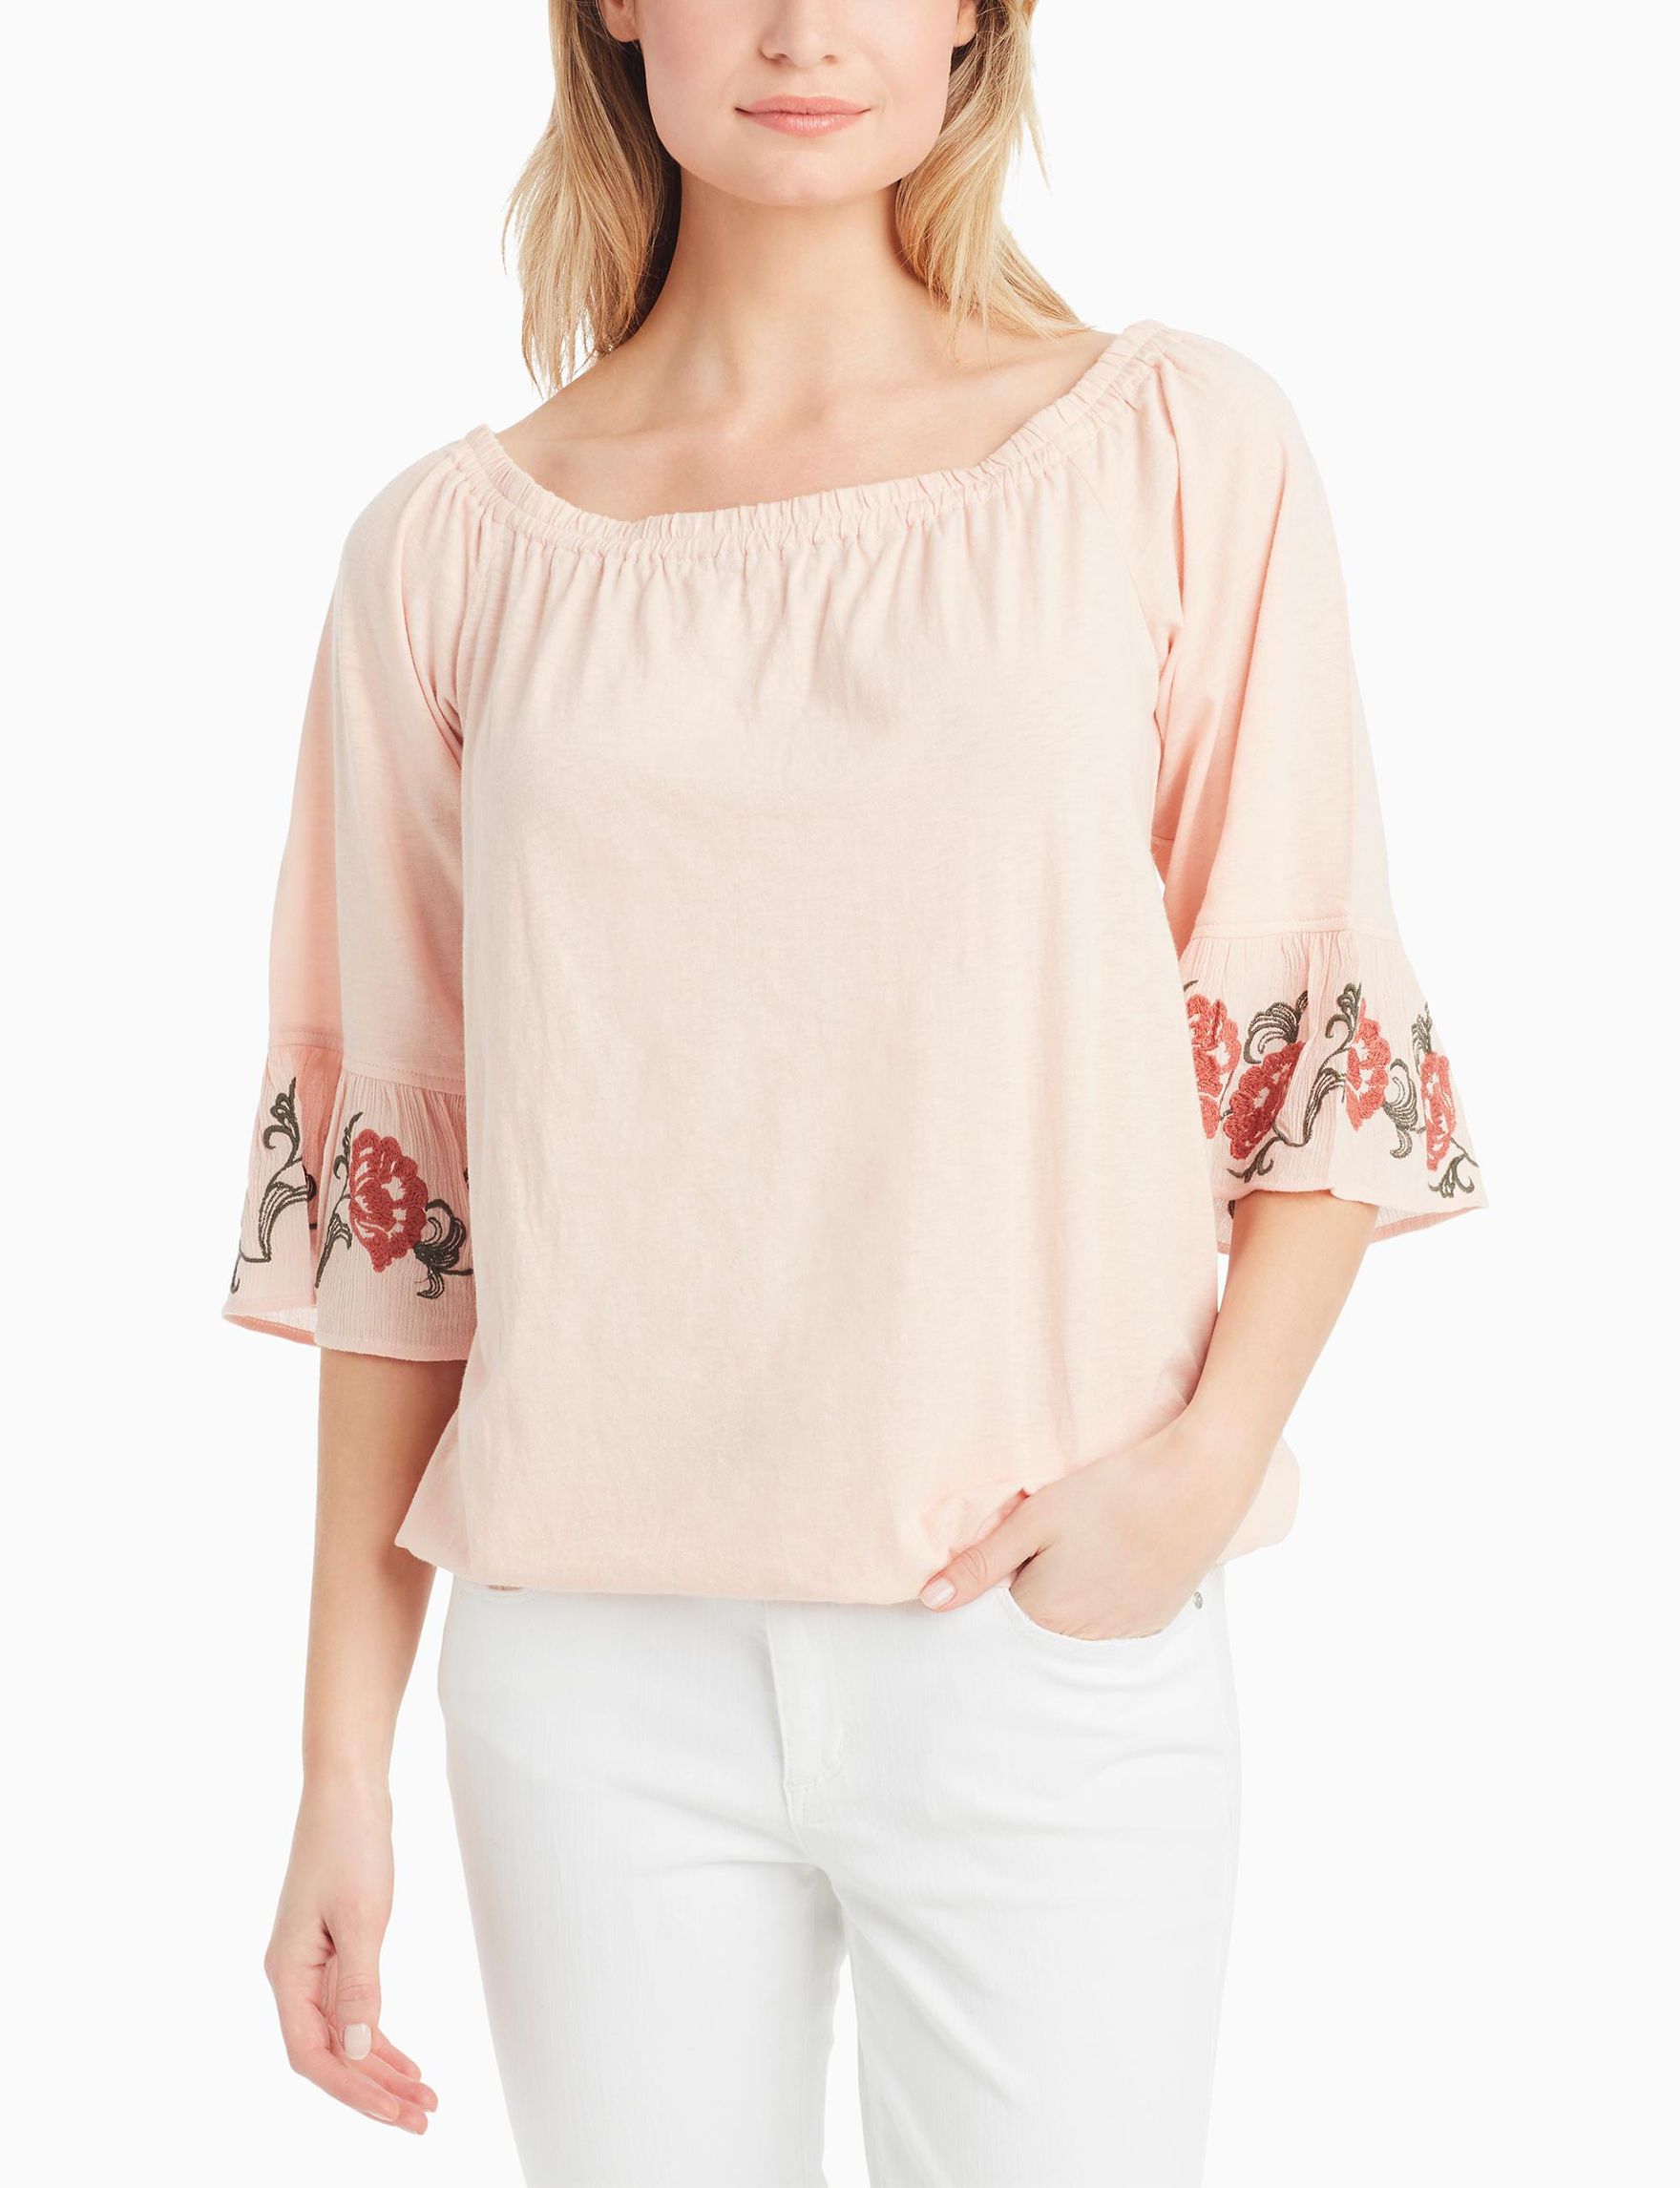 Jessica Simpson Light Pink Shirts & Blouses